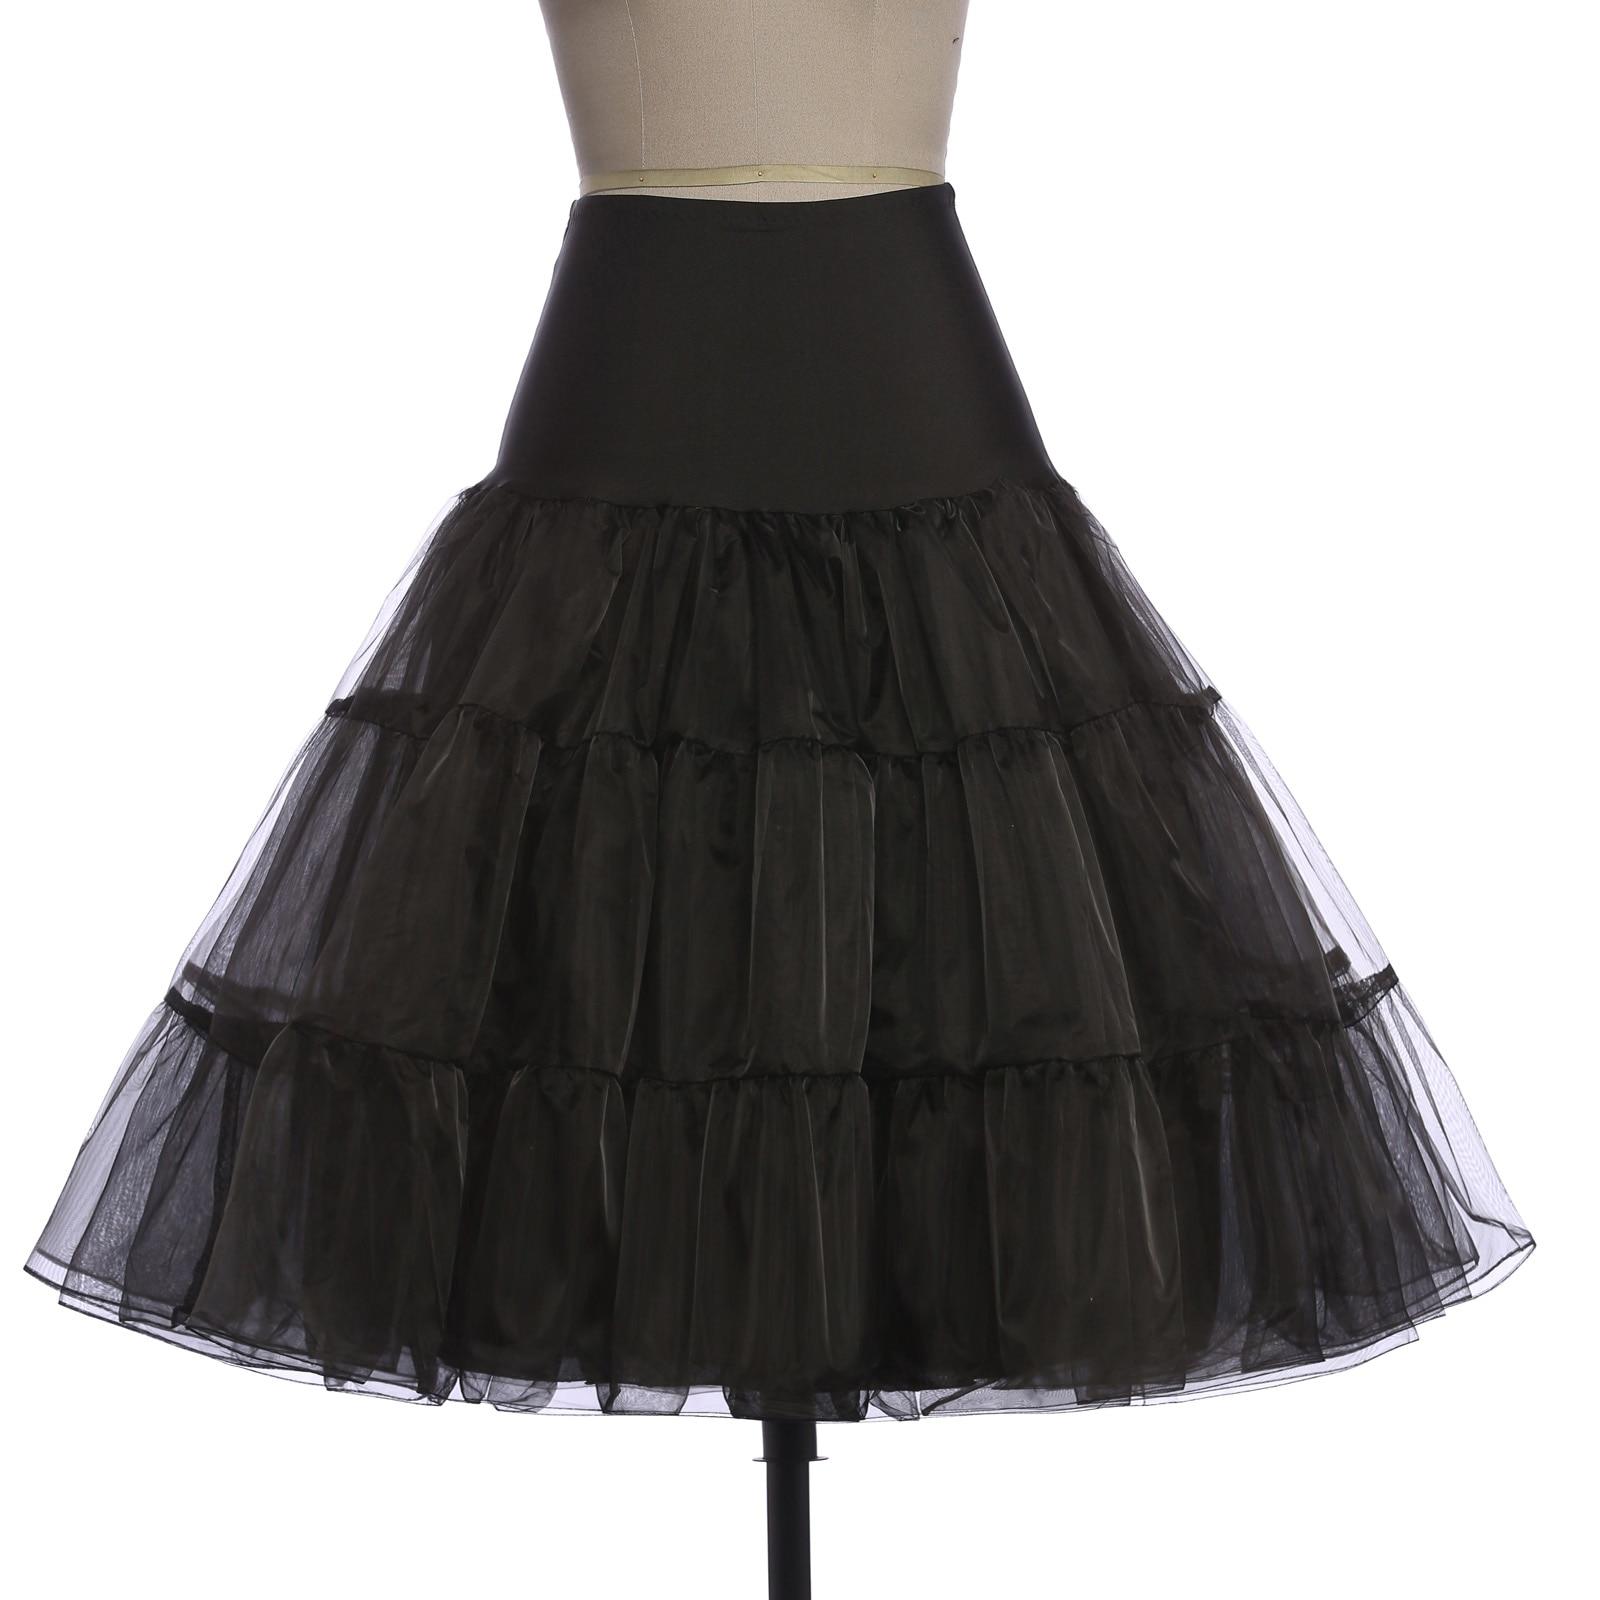 Slips Tulle Skirts Womens Retro Vintage Fluffy Pettiskirt For Wedding Bridal Party Pleated Crinoline Petticoat Underskirt Faldas